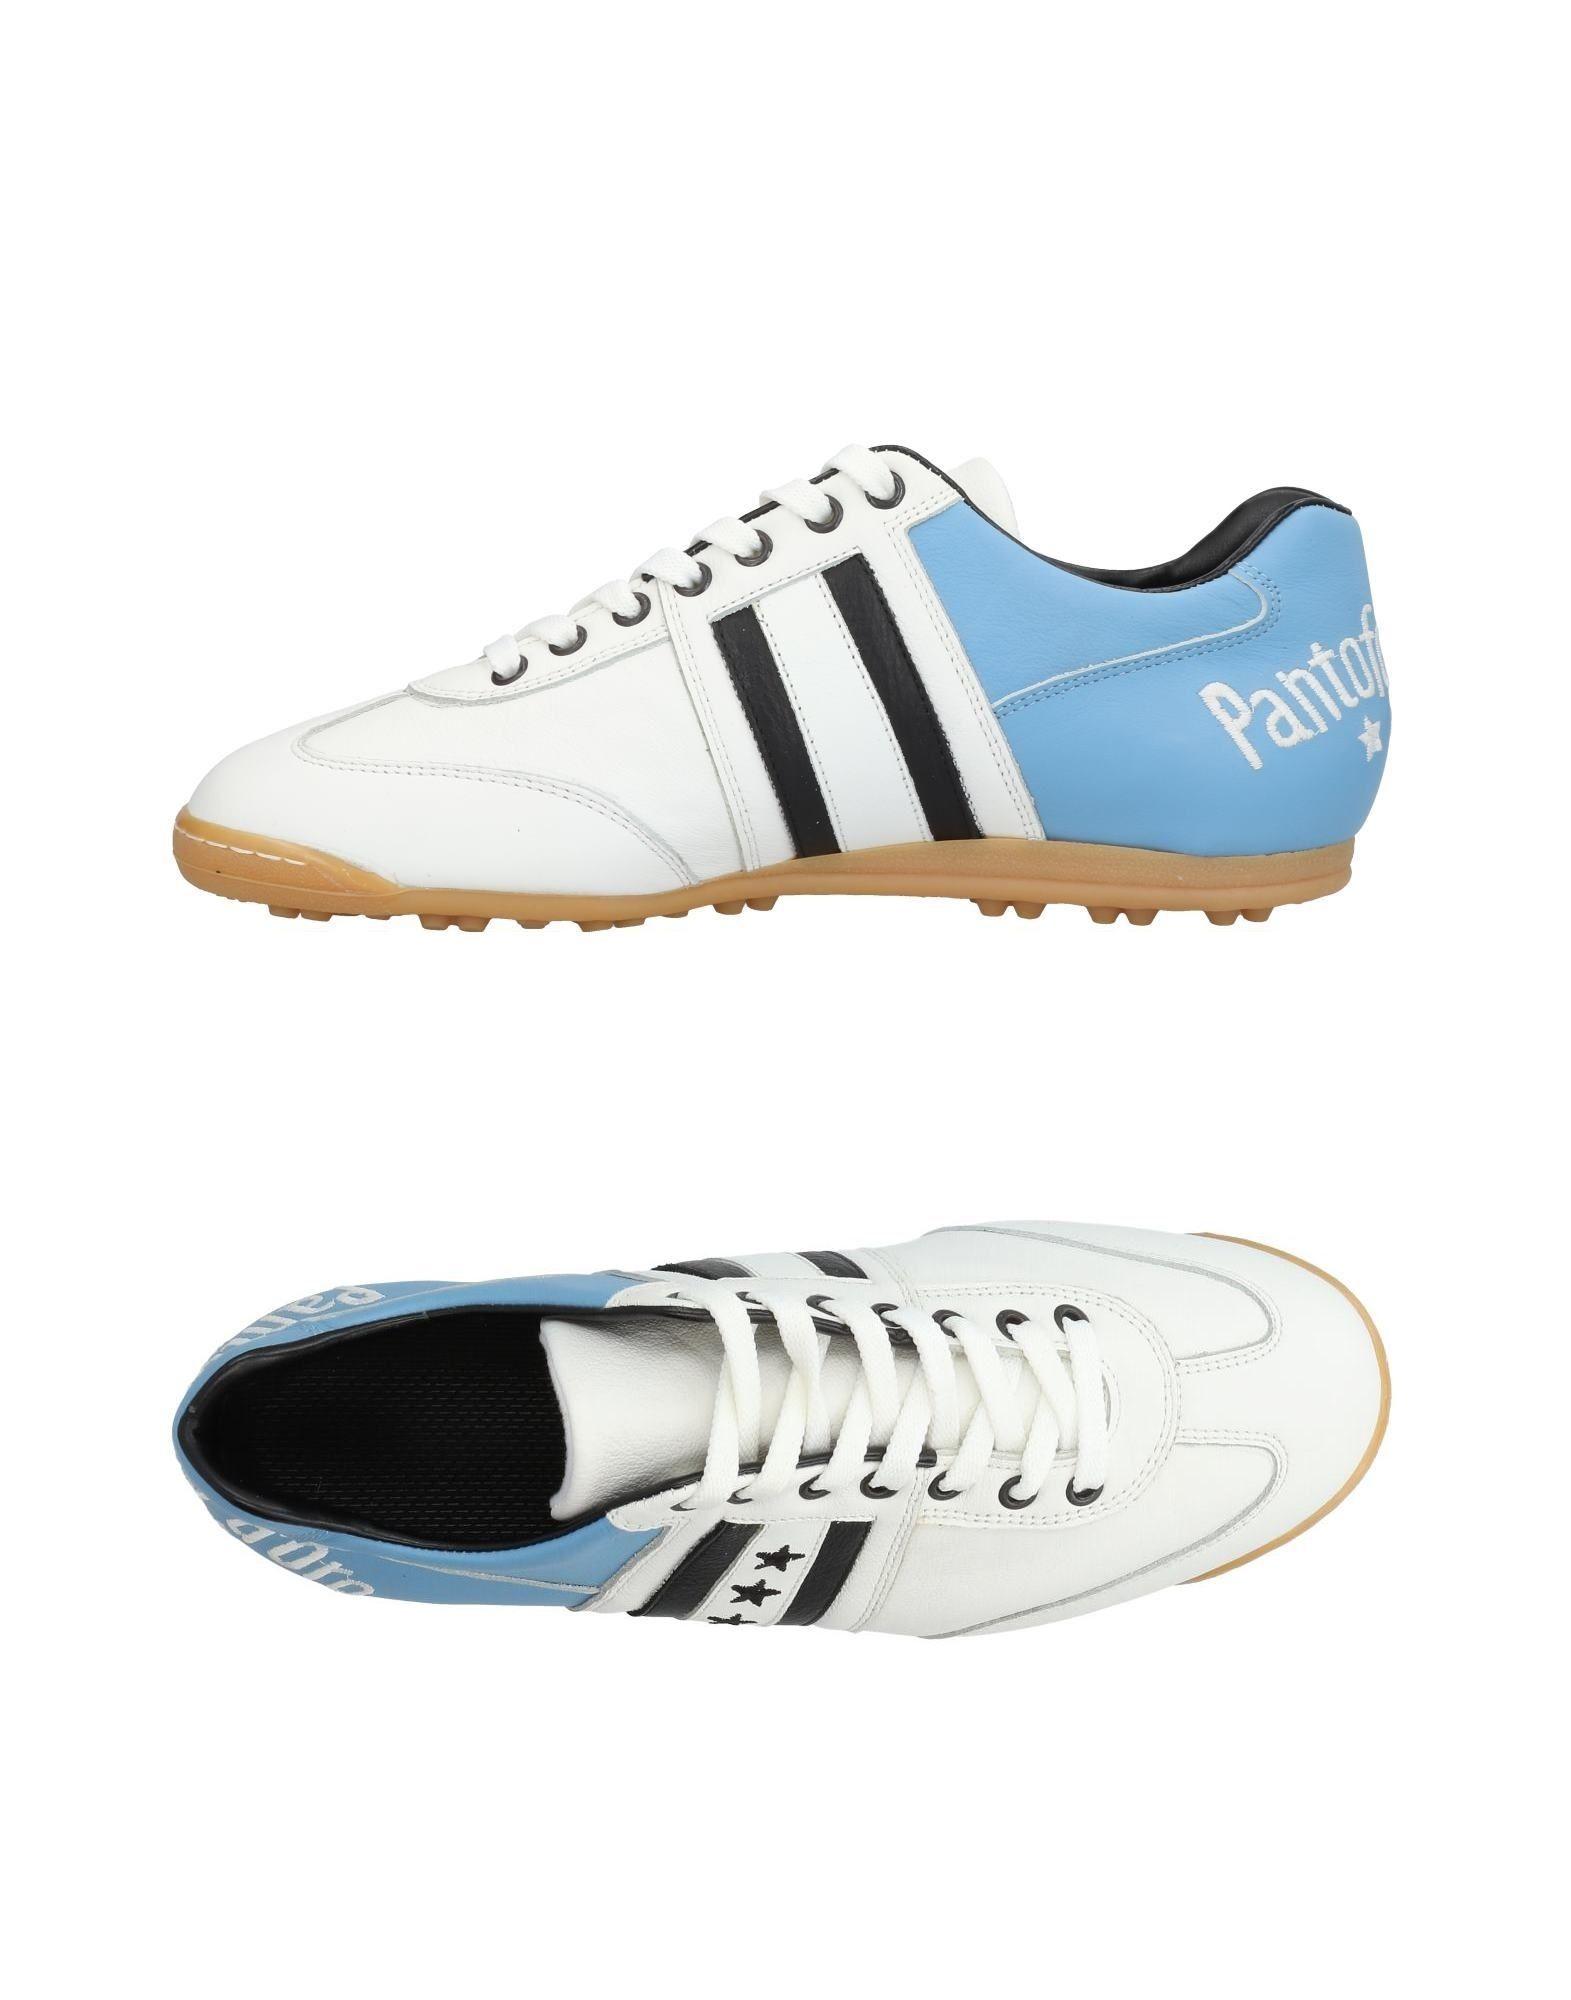 Rabatt D'oro echte Schuhe Pantofola D'oro Rabatt Sneakers Herren  11455644GH a01768